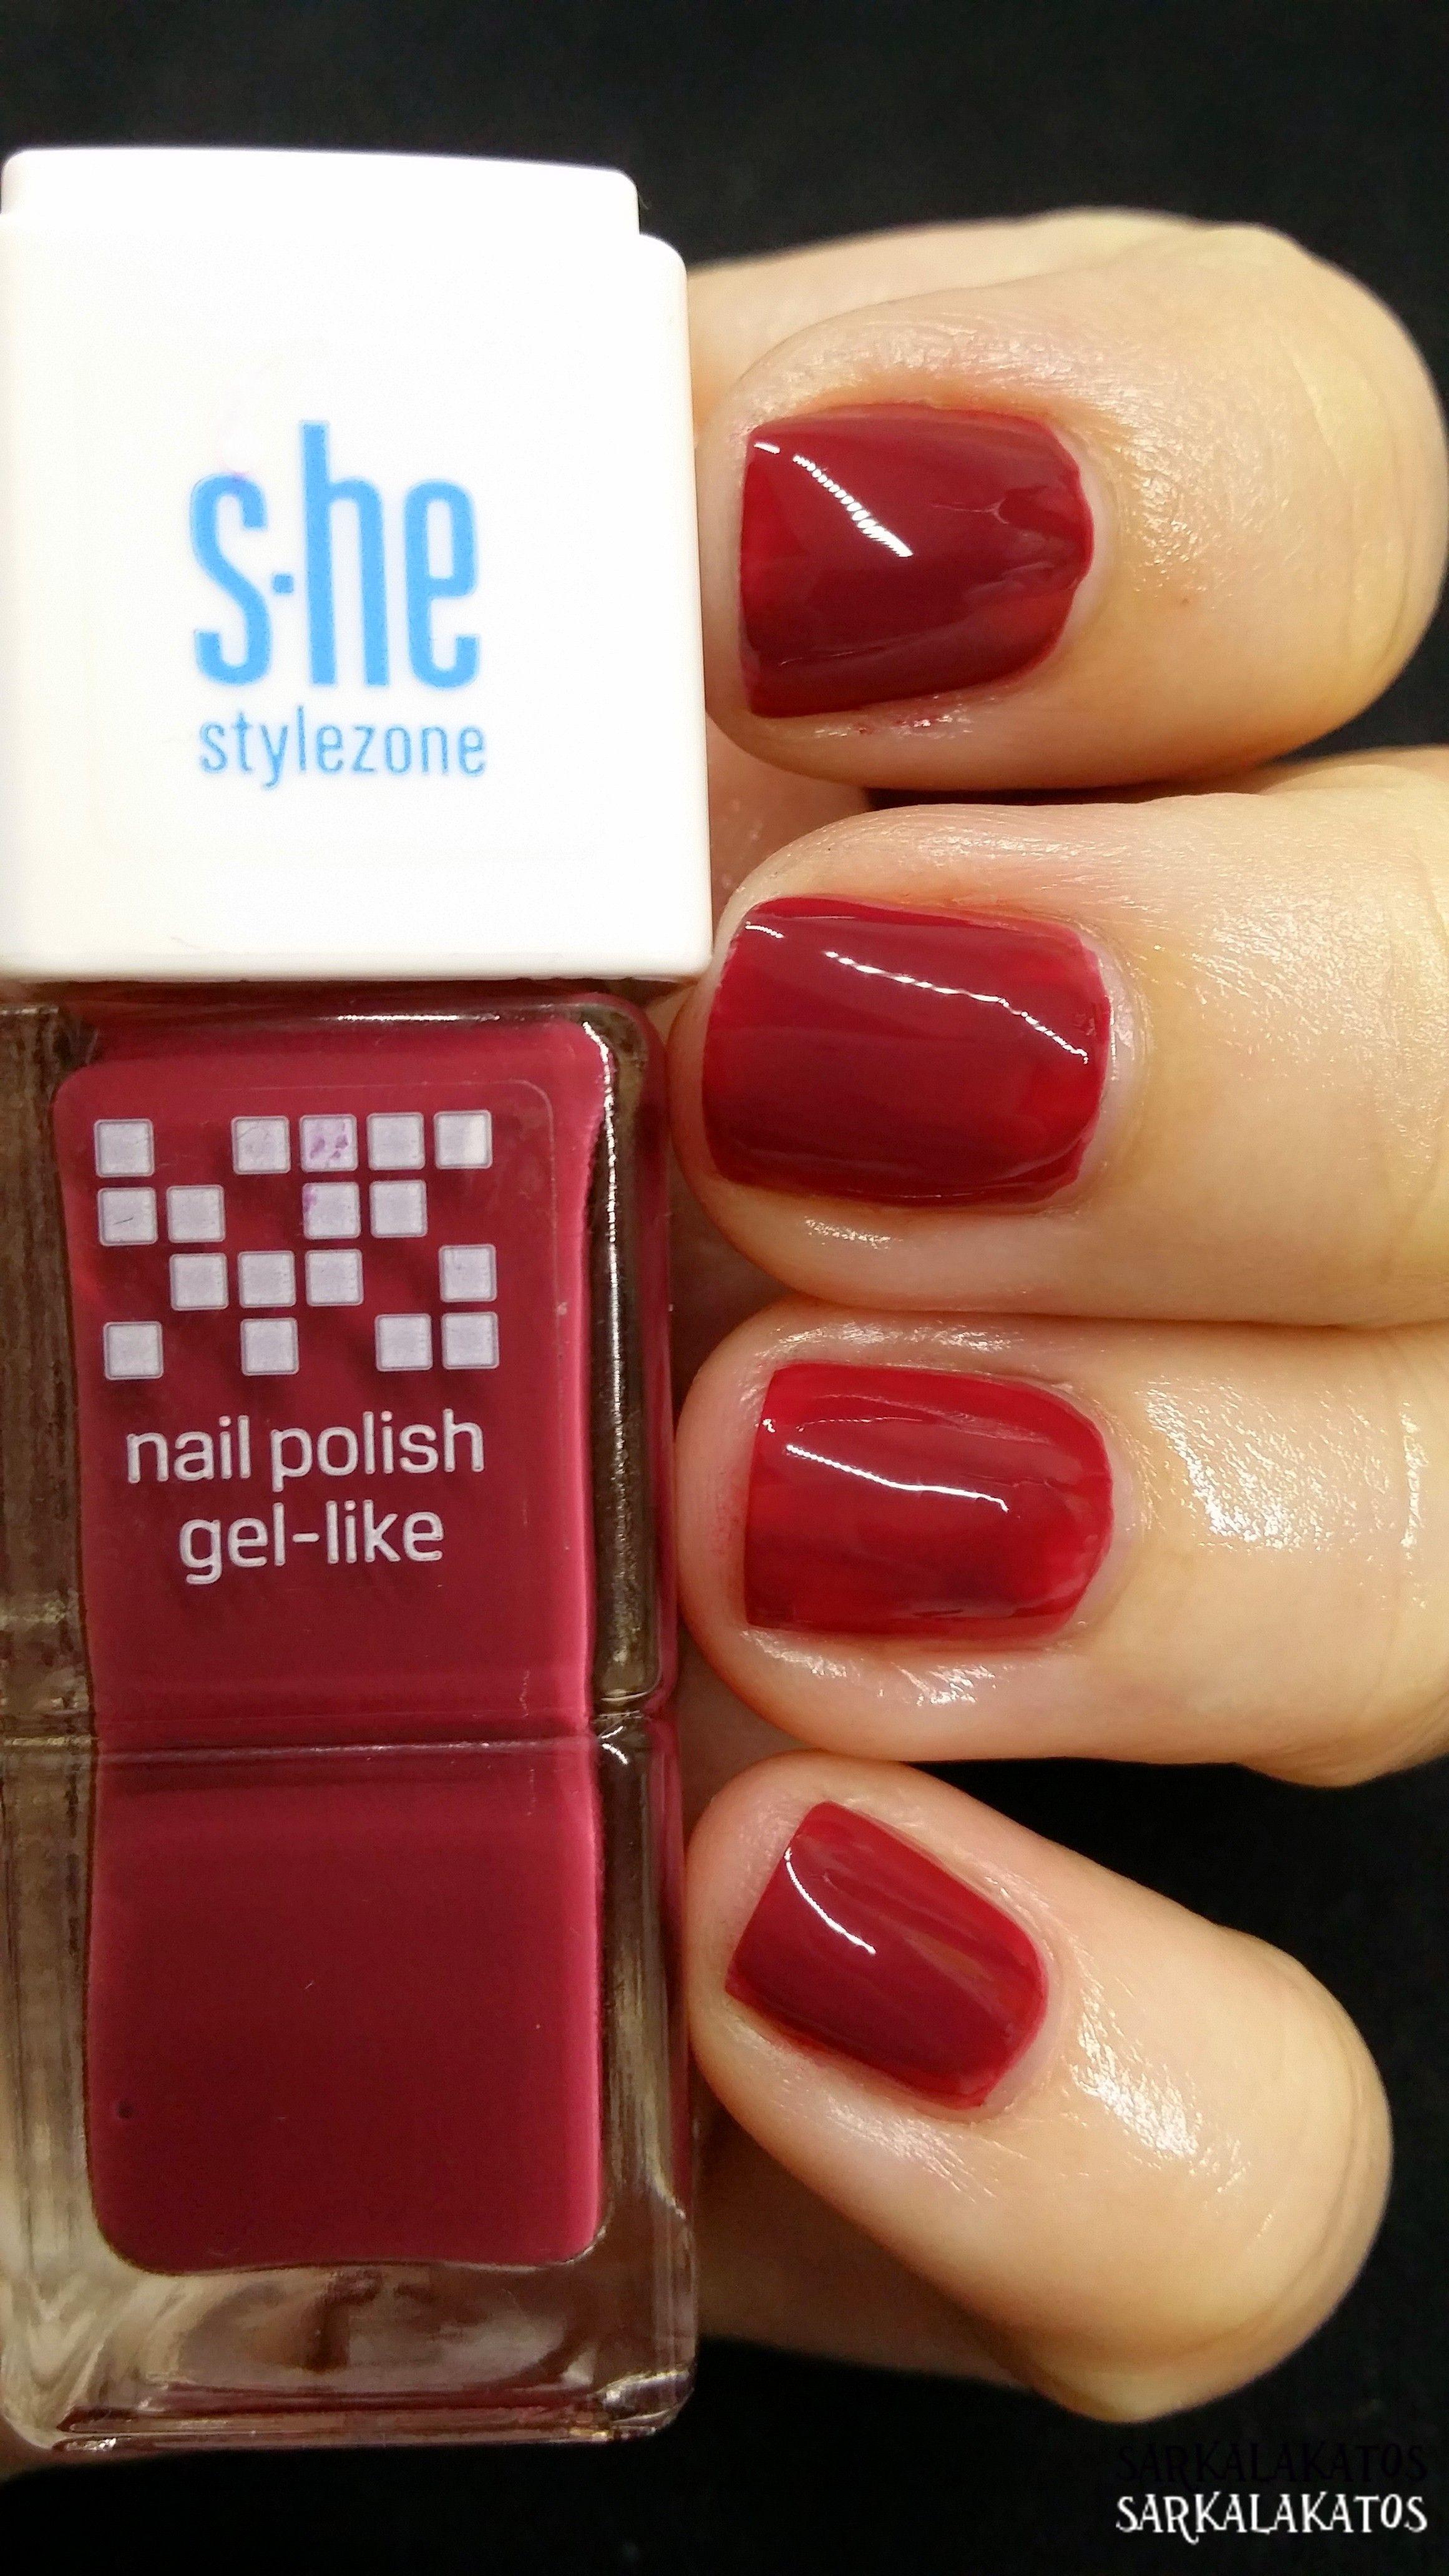 S He Nail Polish Like Gel 545